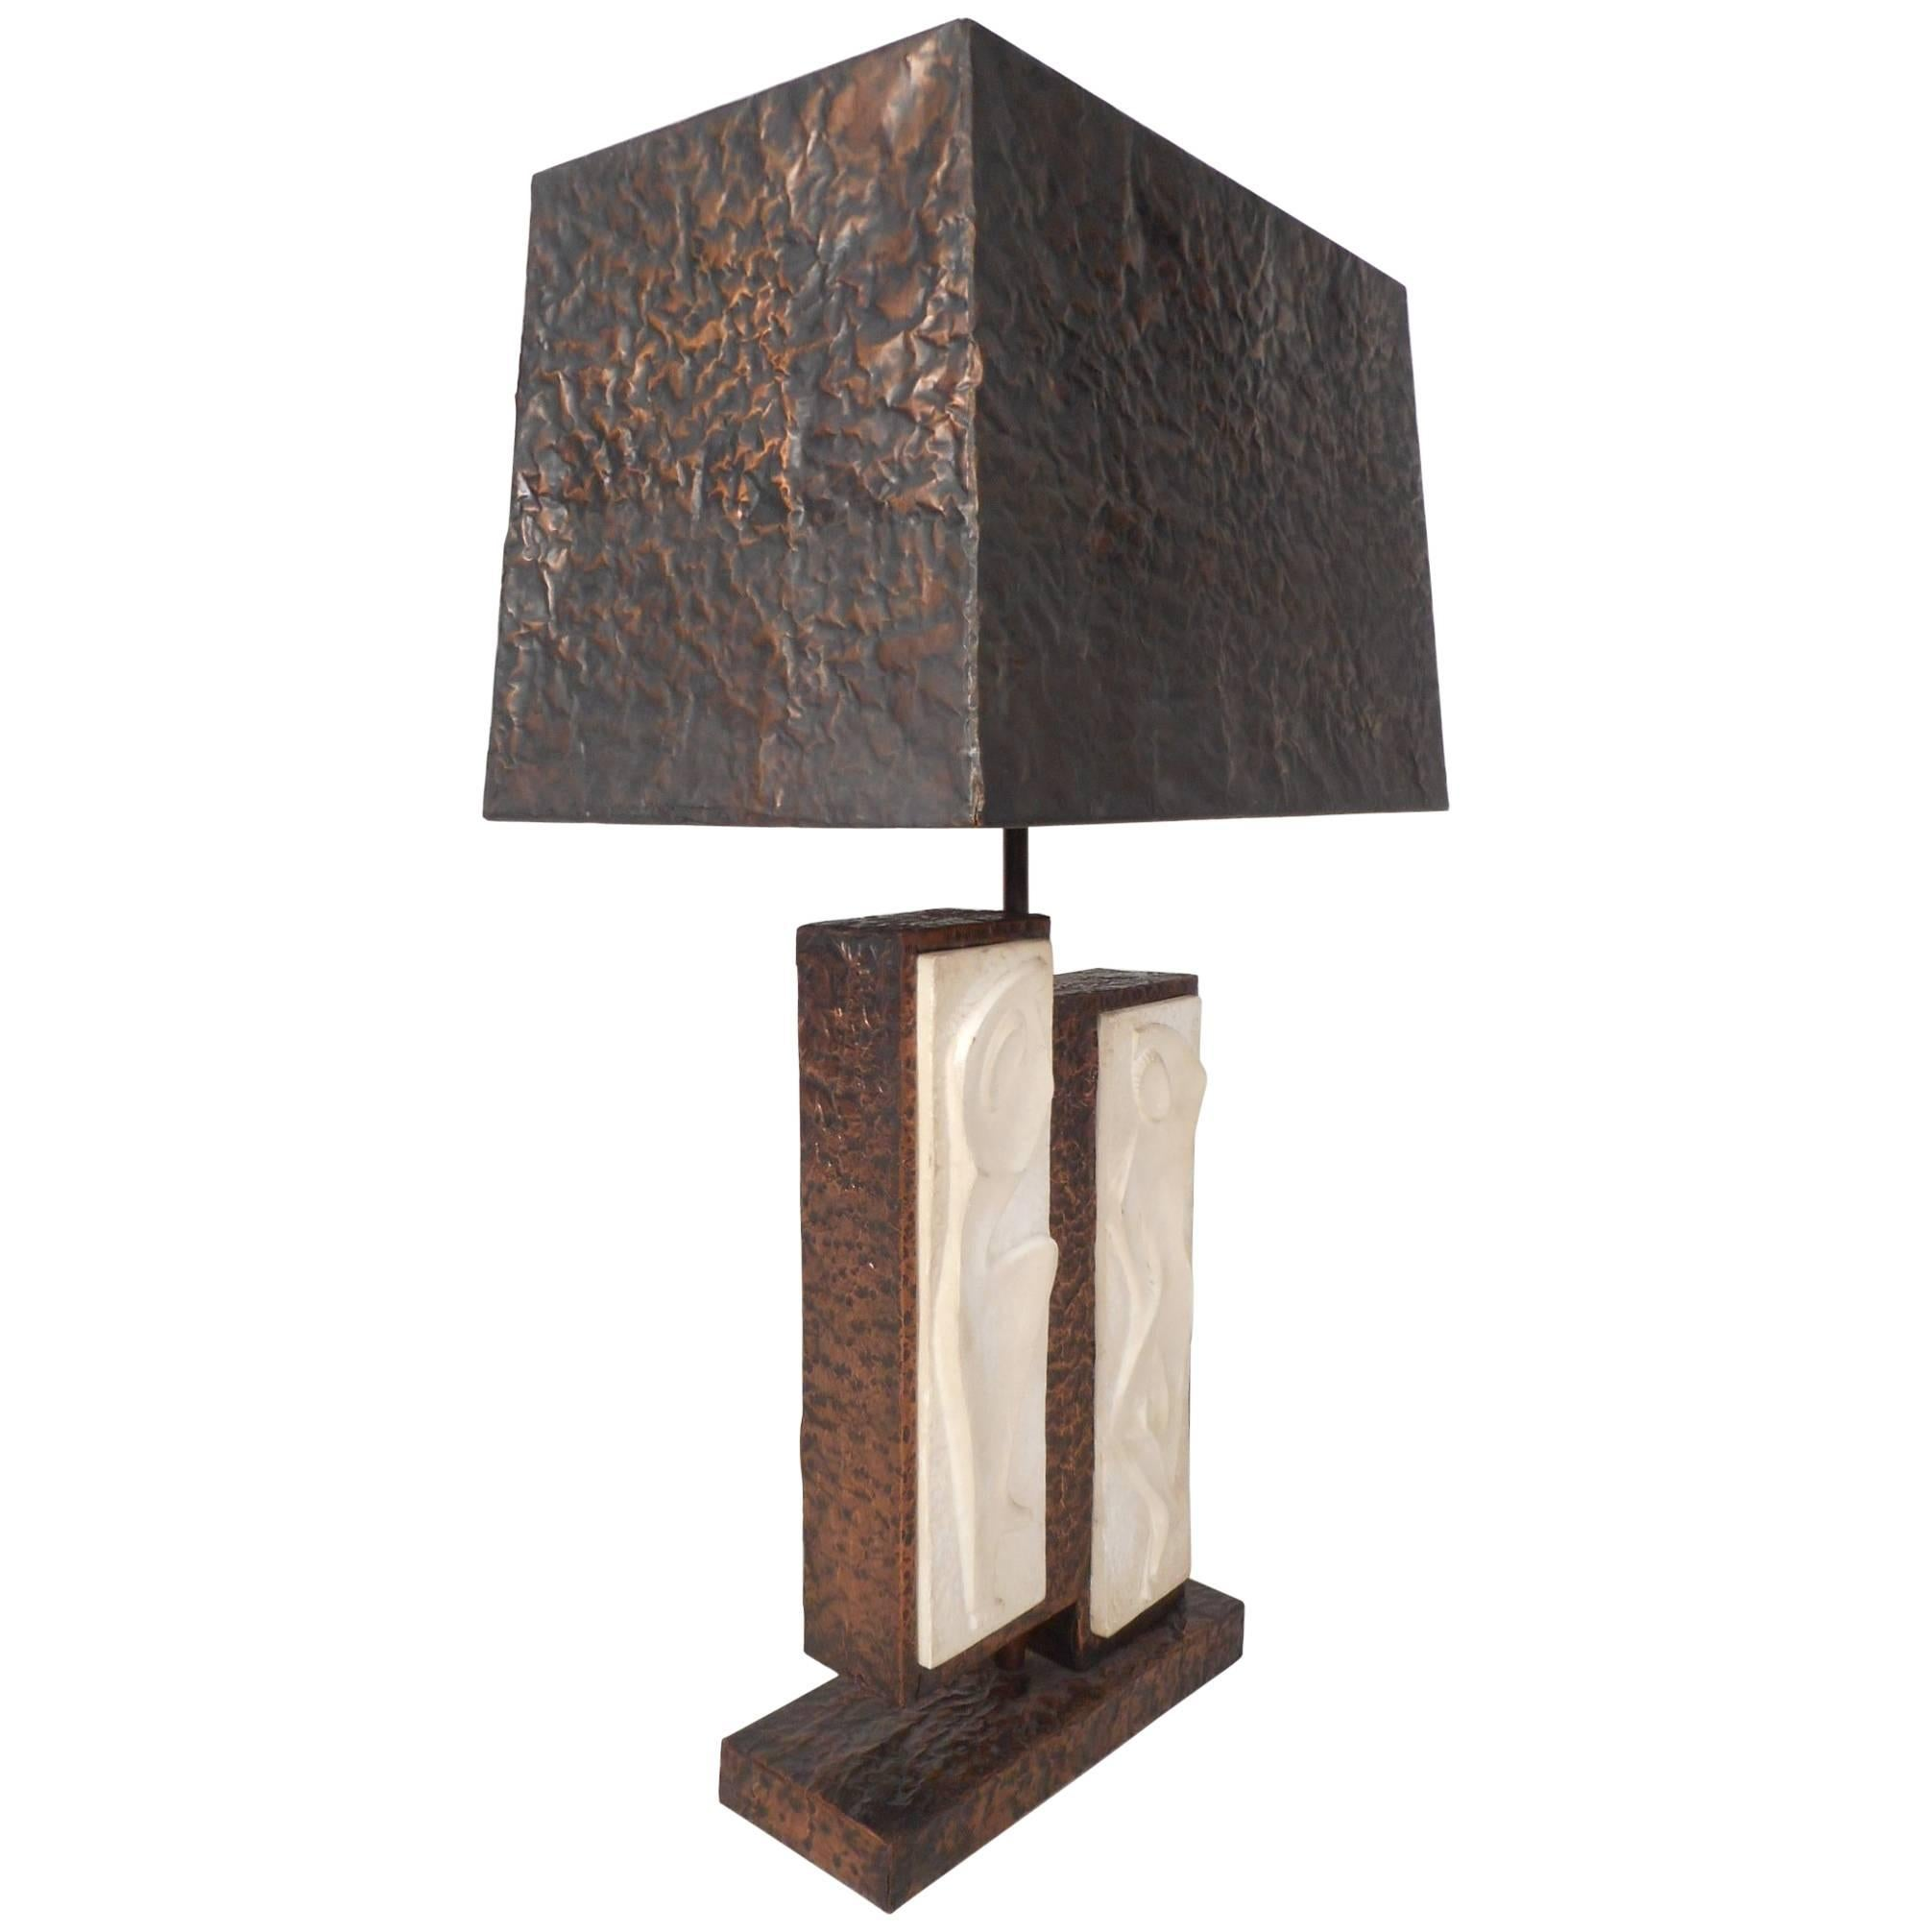 Unique Mid-Century Modern Textured Copper Table Lamp